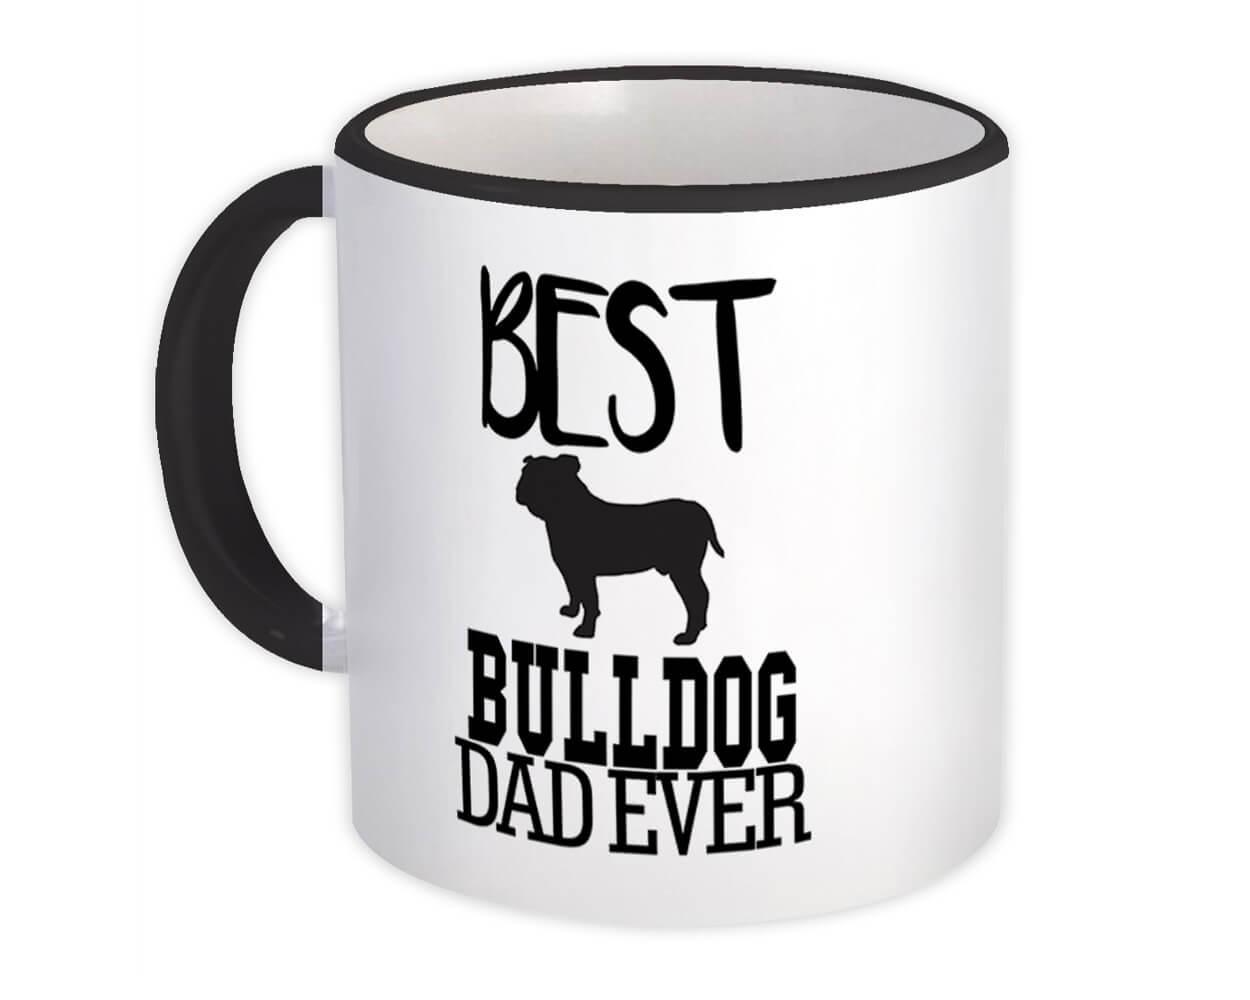 Best Bulldog Dad Ever : Gift Mug Dog Silhouette Funny Pet Cartoon Owner